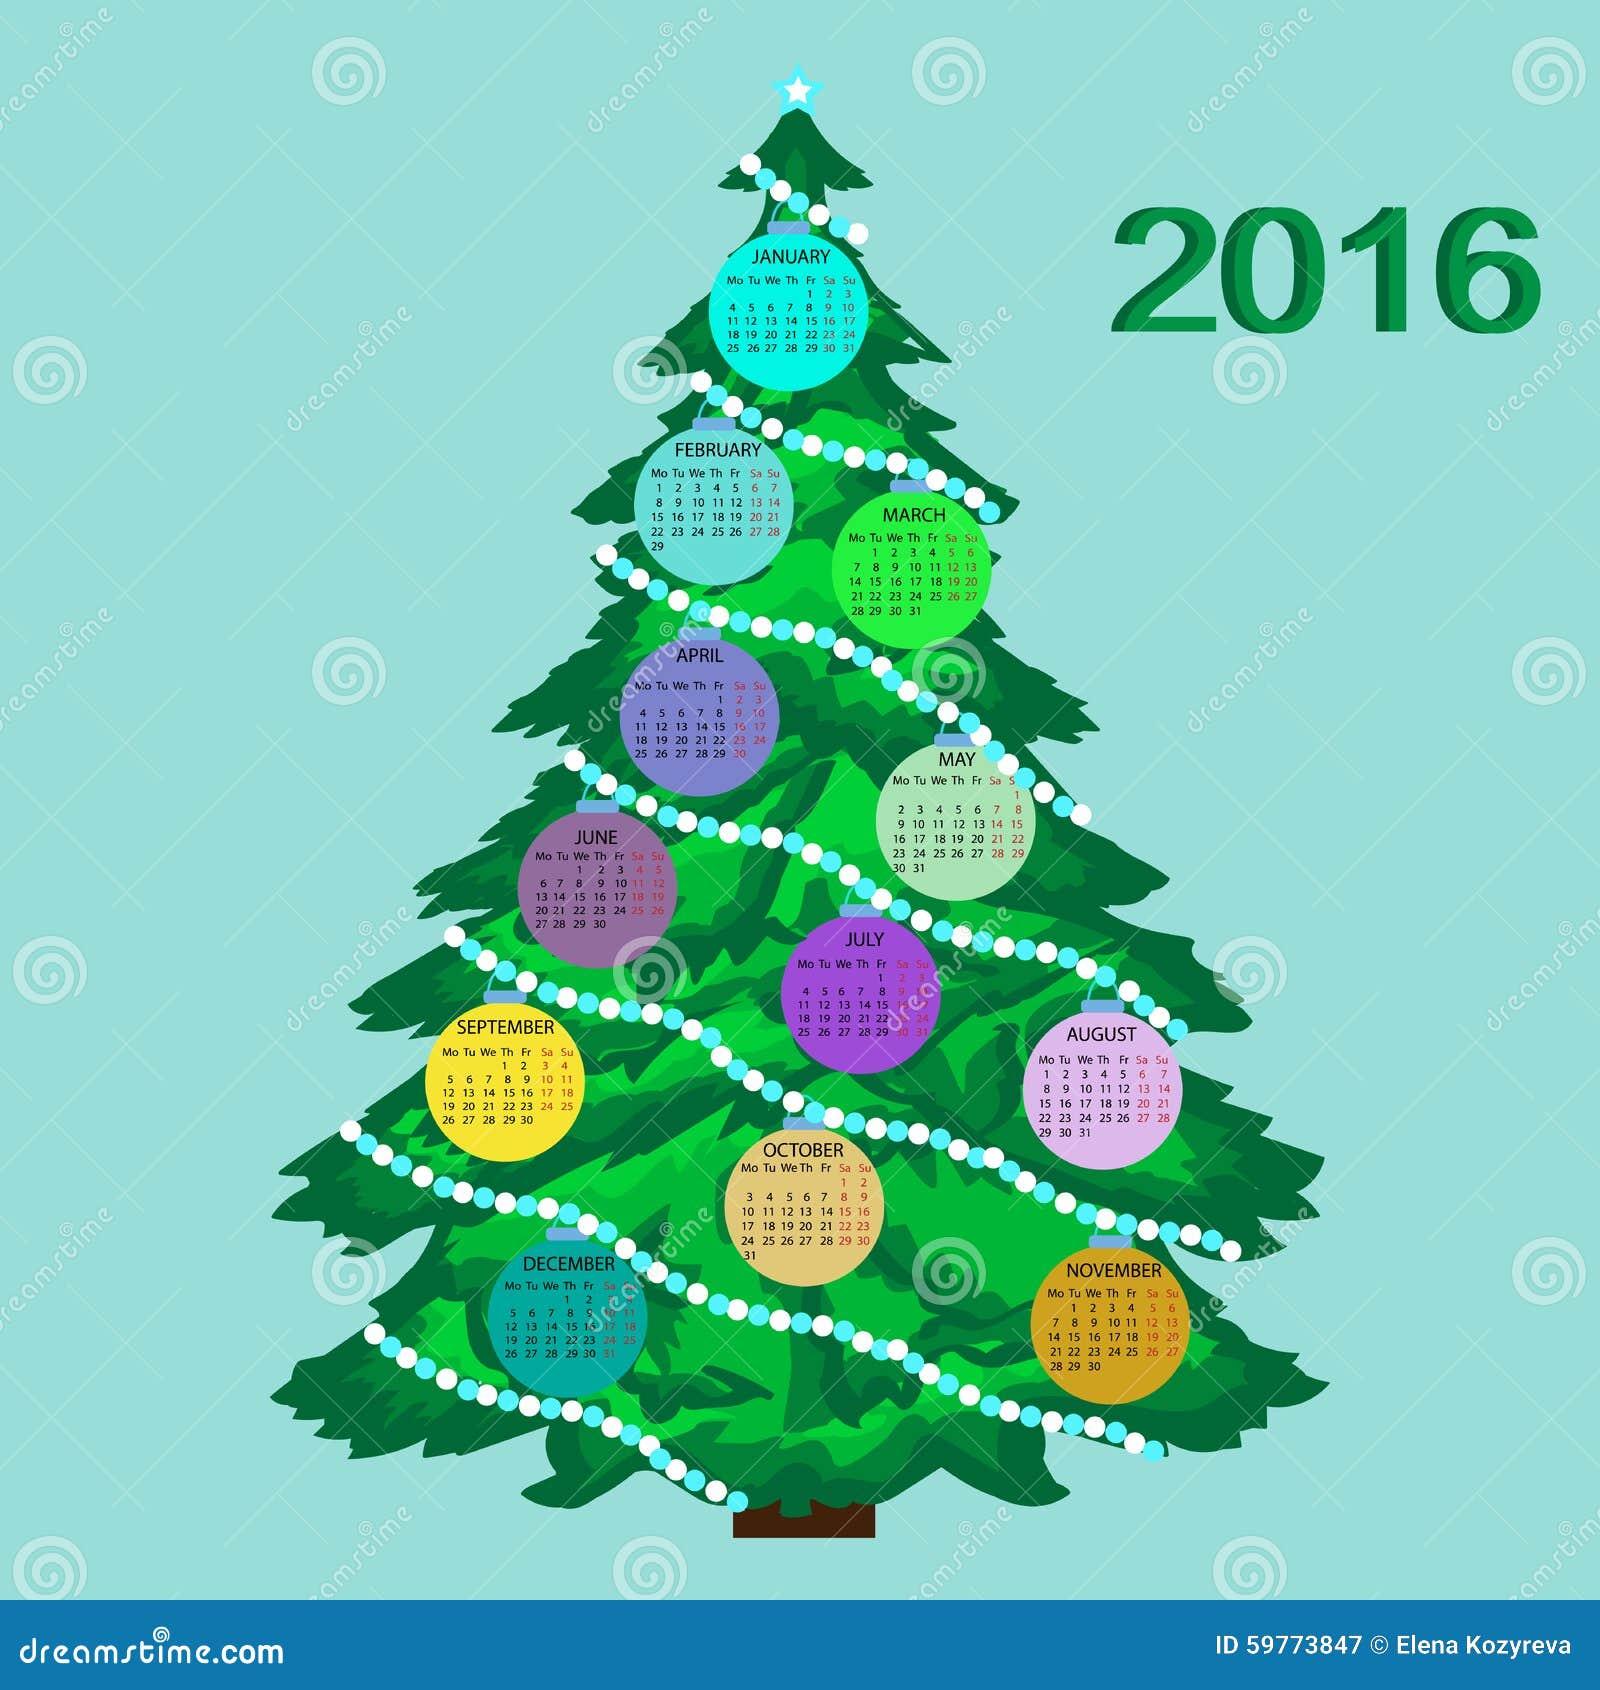 Home Design Editorial Calendar 2016: Christmas Tree Calendar 2016 New Year Stock Illustration